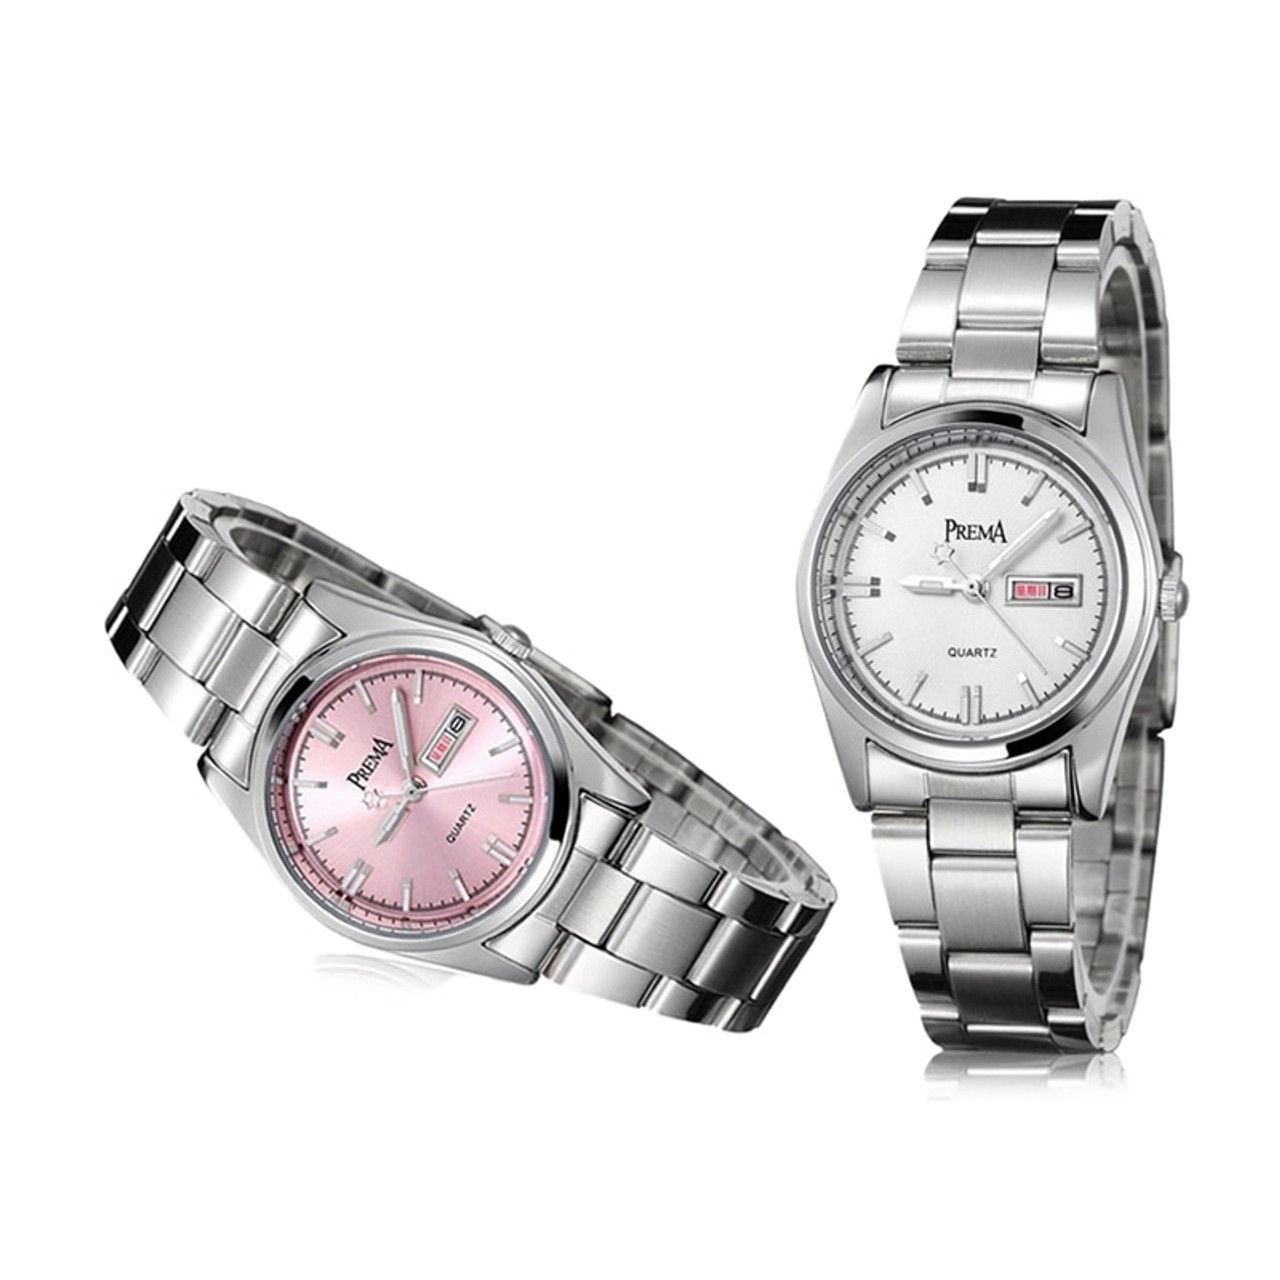 70150e8911ef PREMA Luxury Brand Fashion Watches Women Watch Ladies Rhinestone Quartz  Watch Women s Dress Clock Wristwatches relojes ...